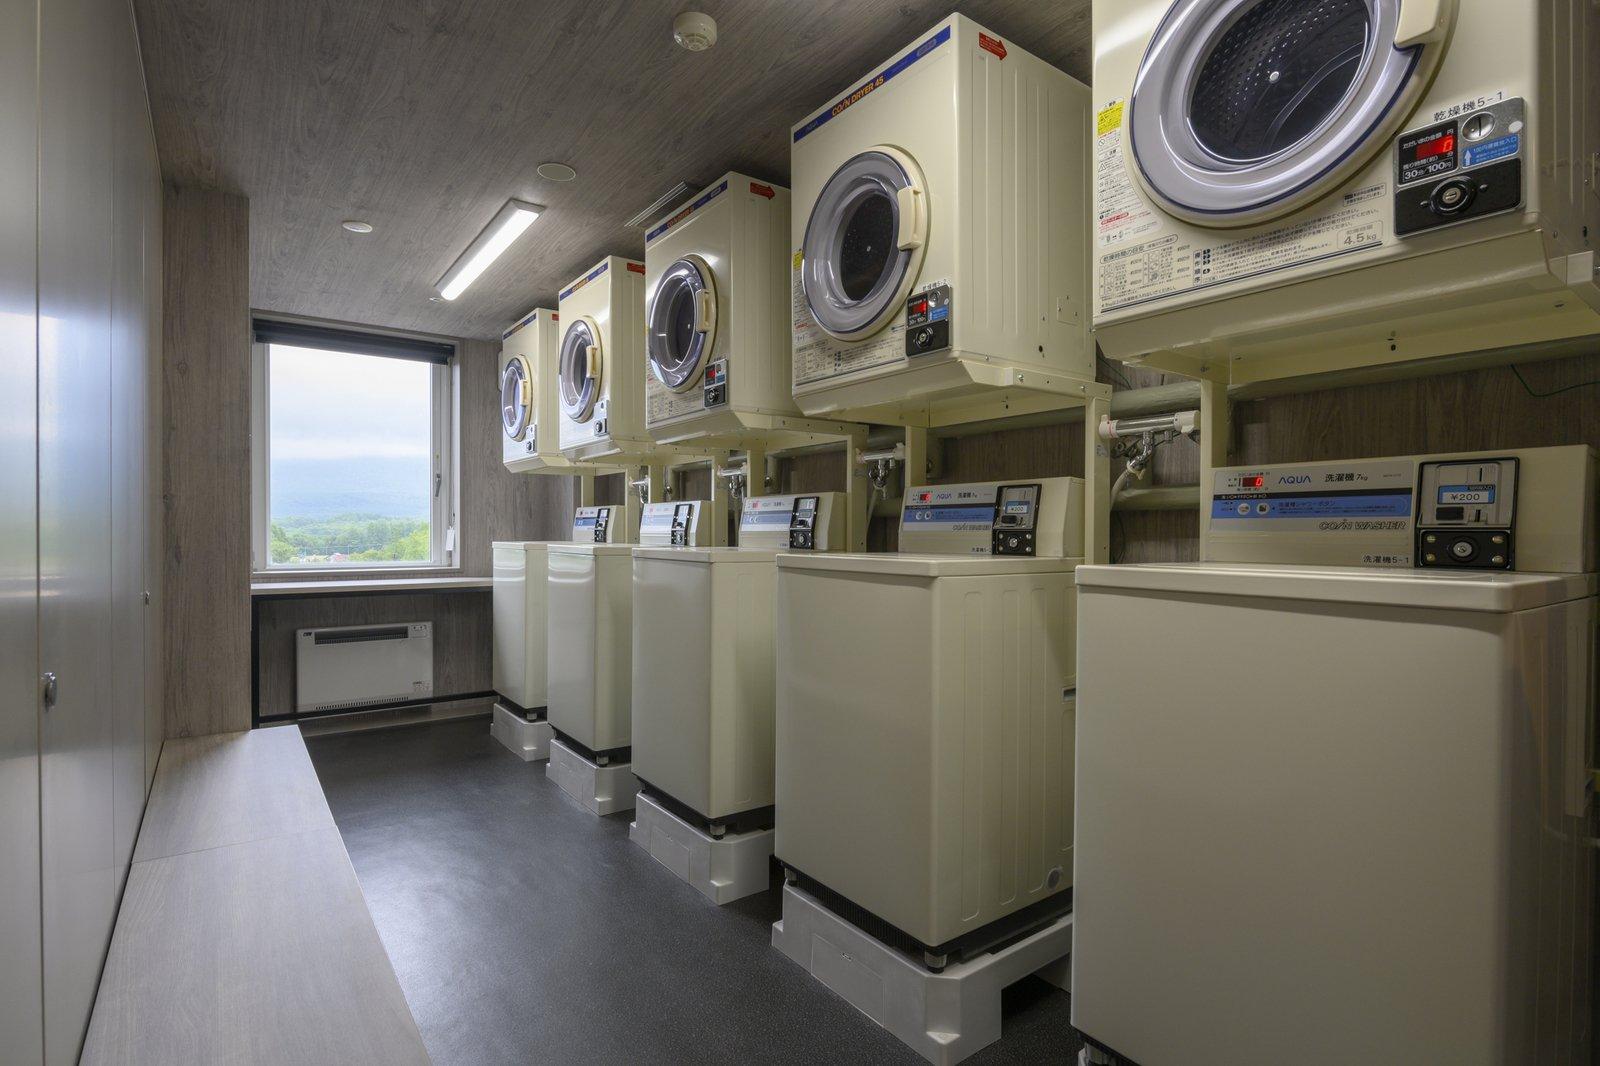 Midtown niseko laundry room large